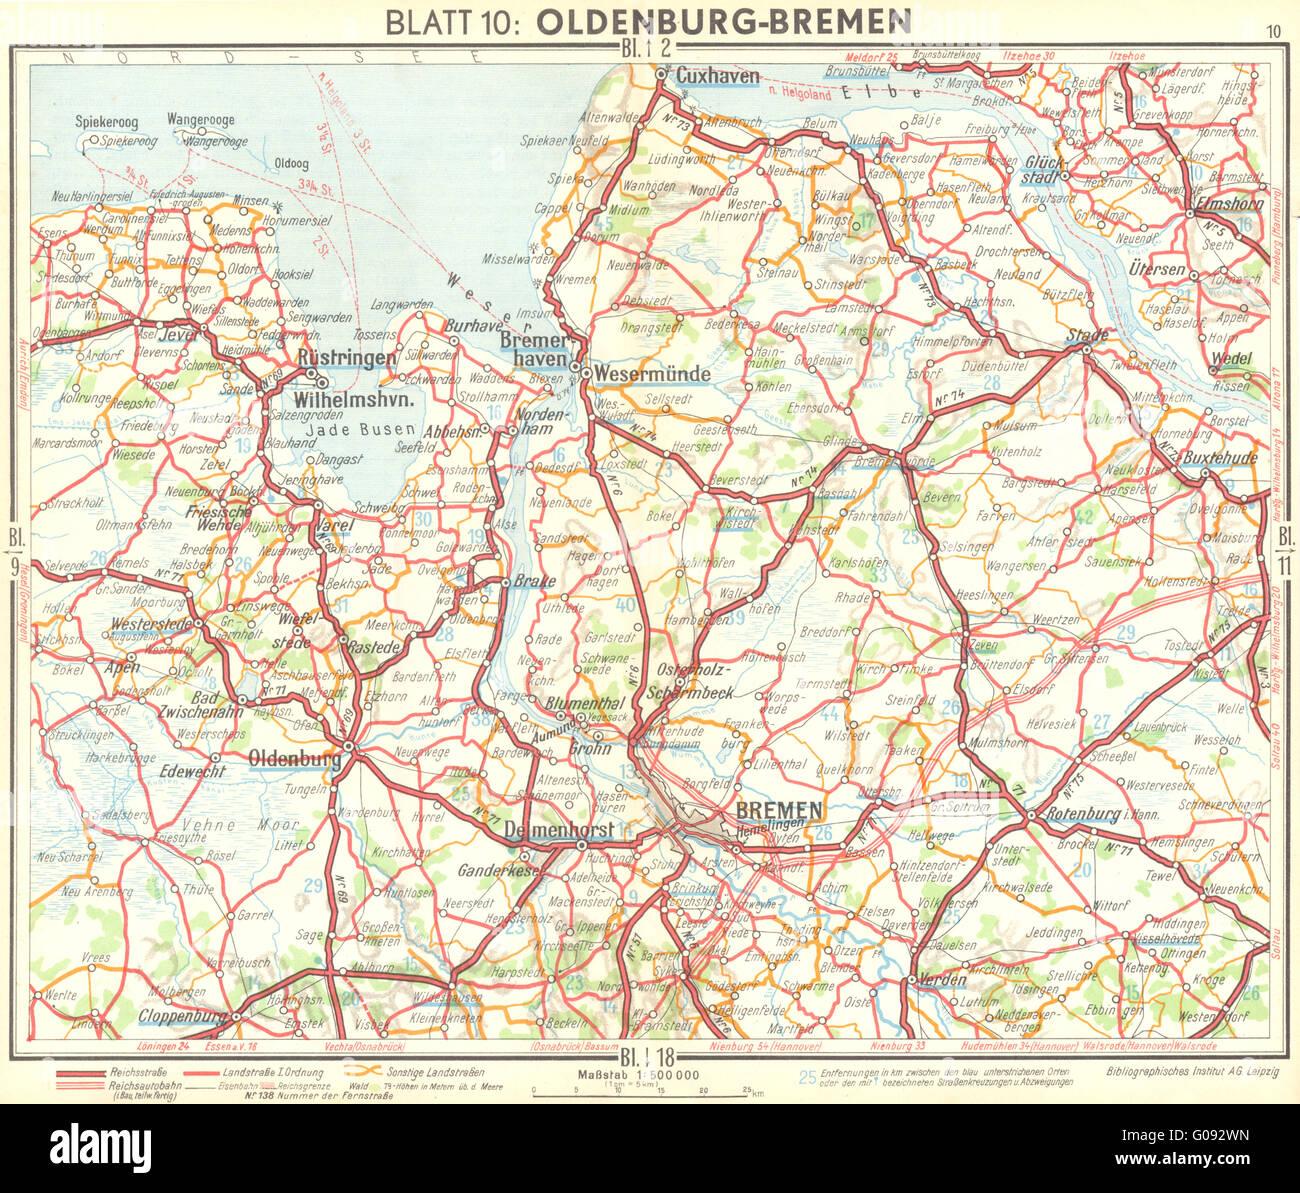 Bremen Map Stock Photos & Bremen Map Stock Images - Alamy